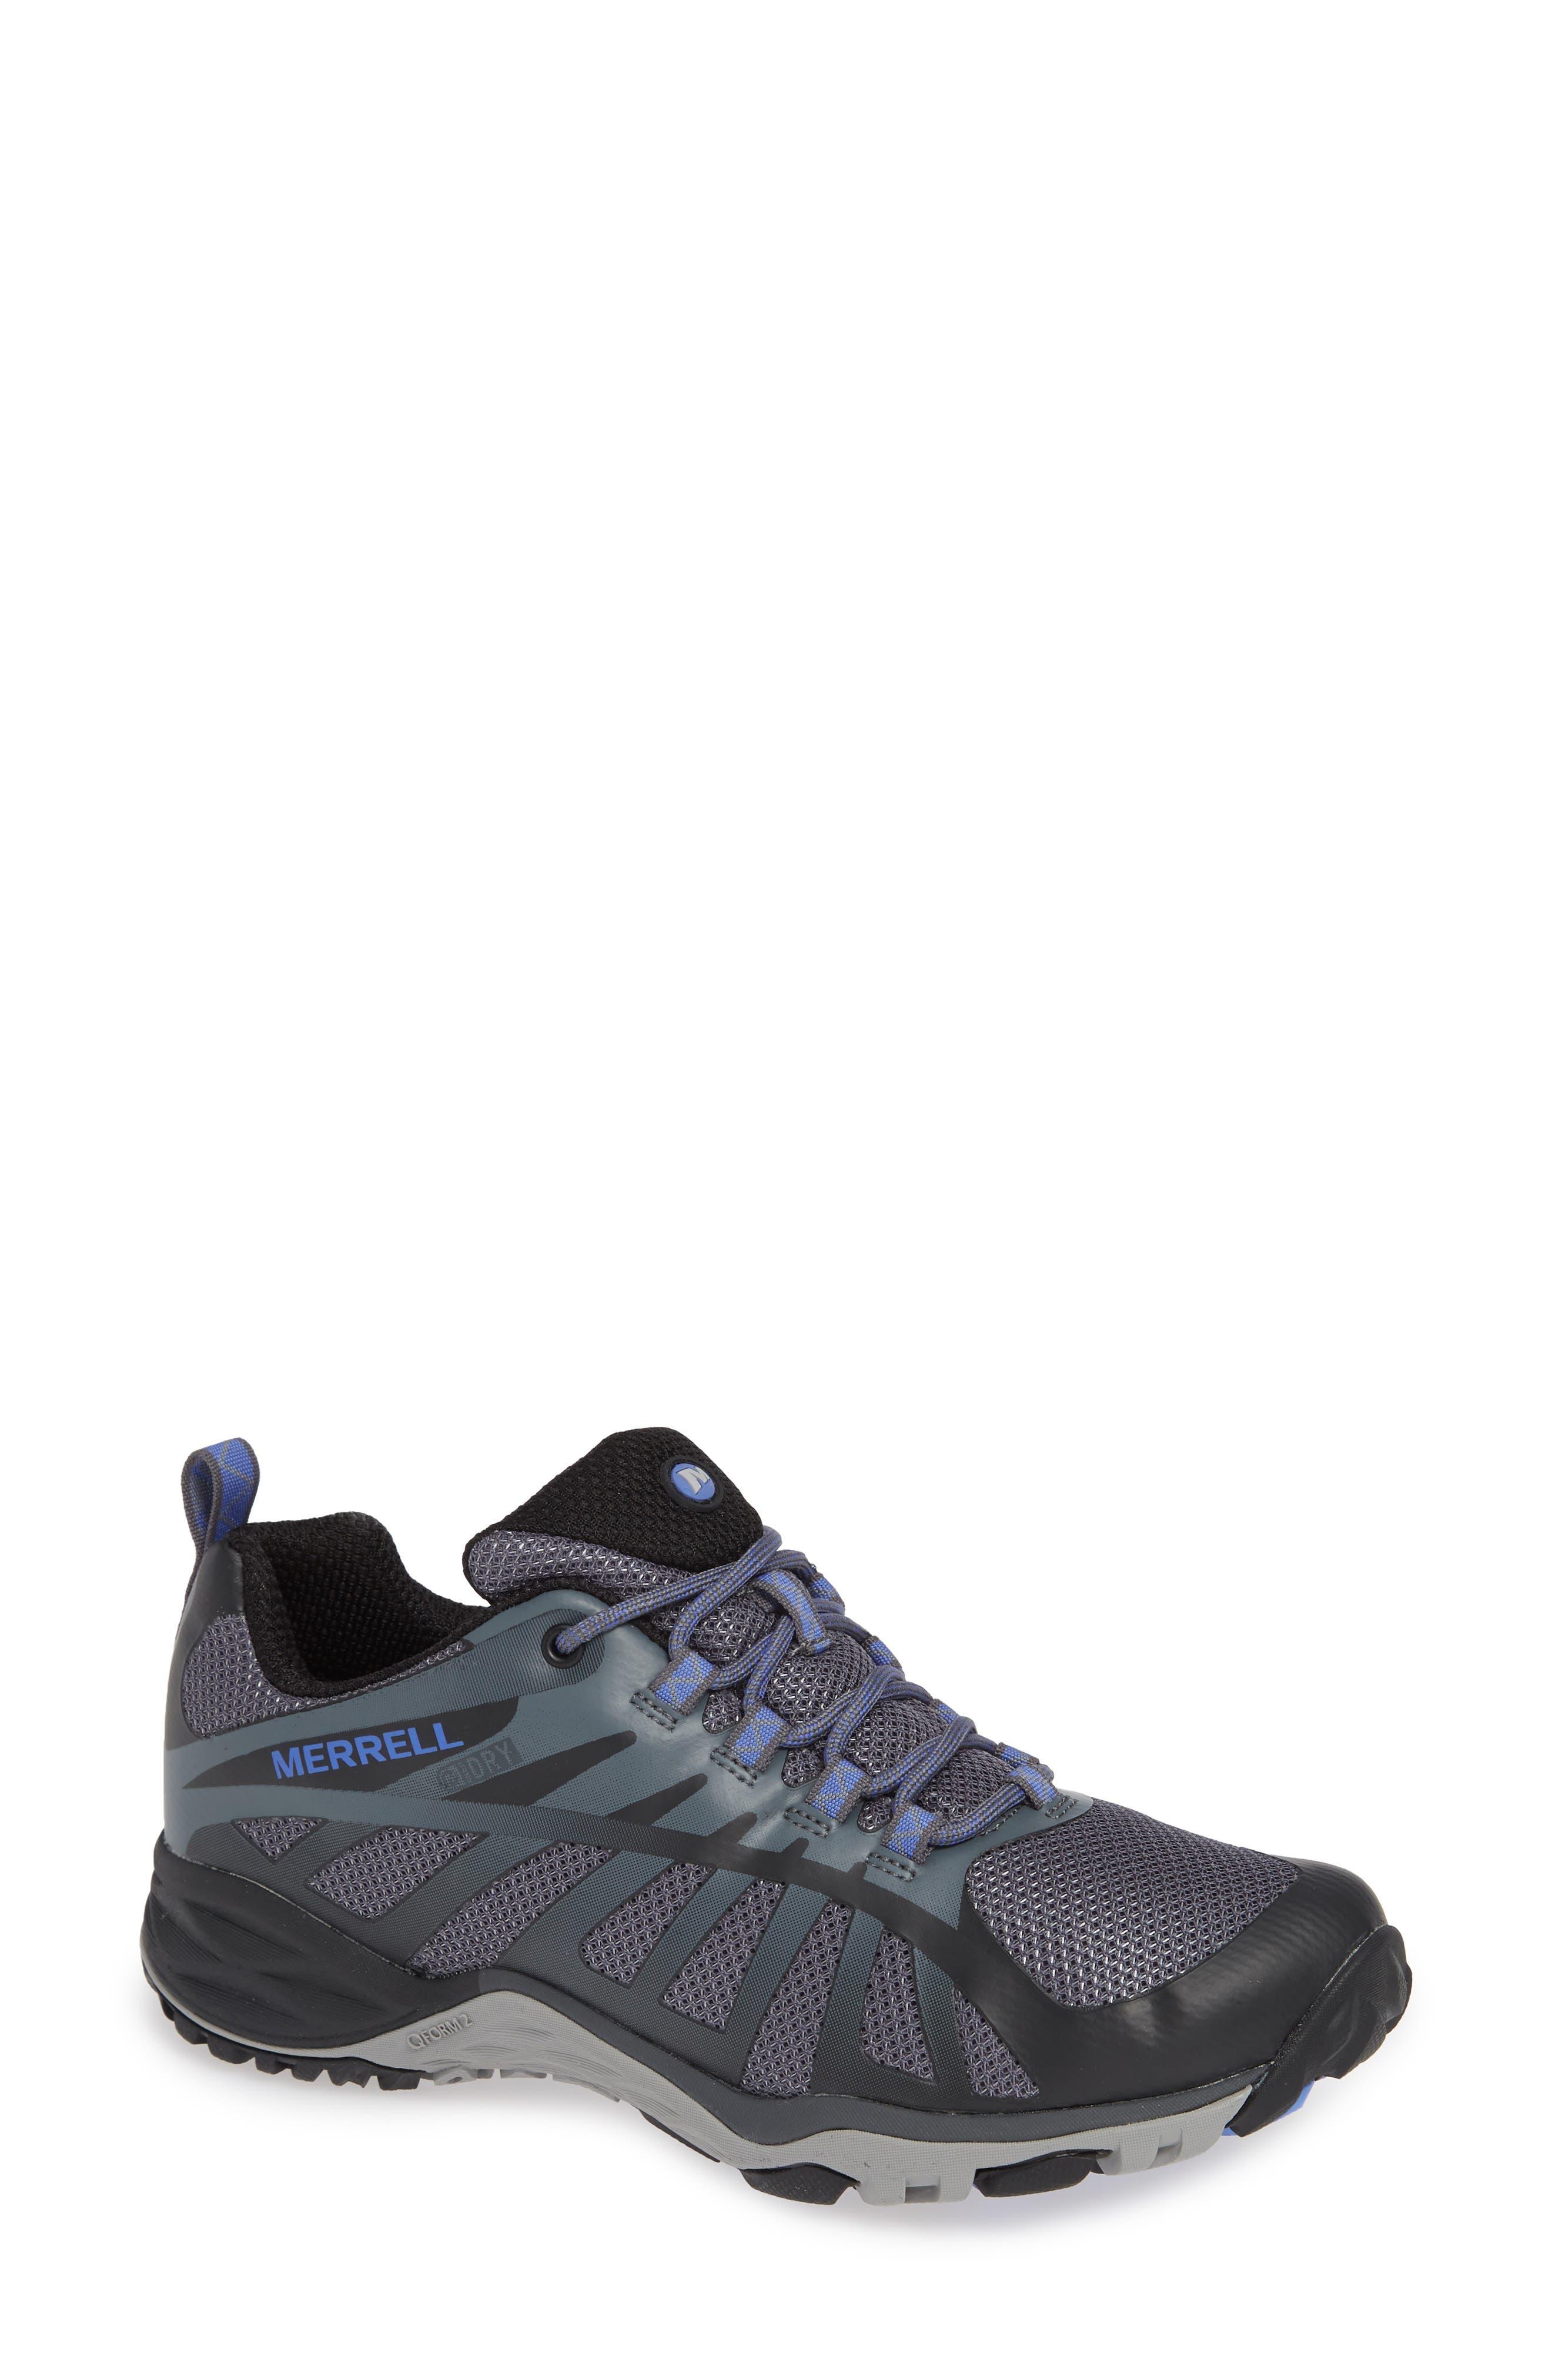 MERRELL Siren Edge Waterproof Q2 Hiking Shoe, Main, color, BLACK FABRIC